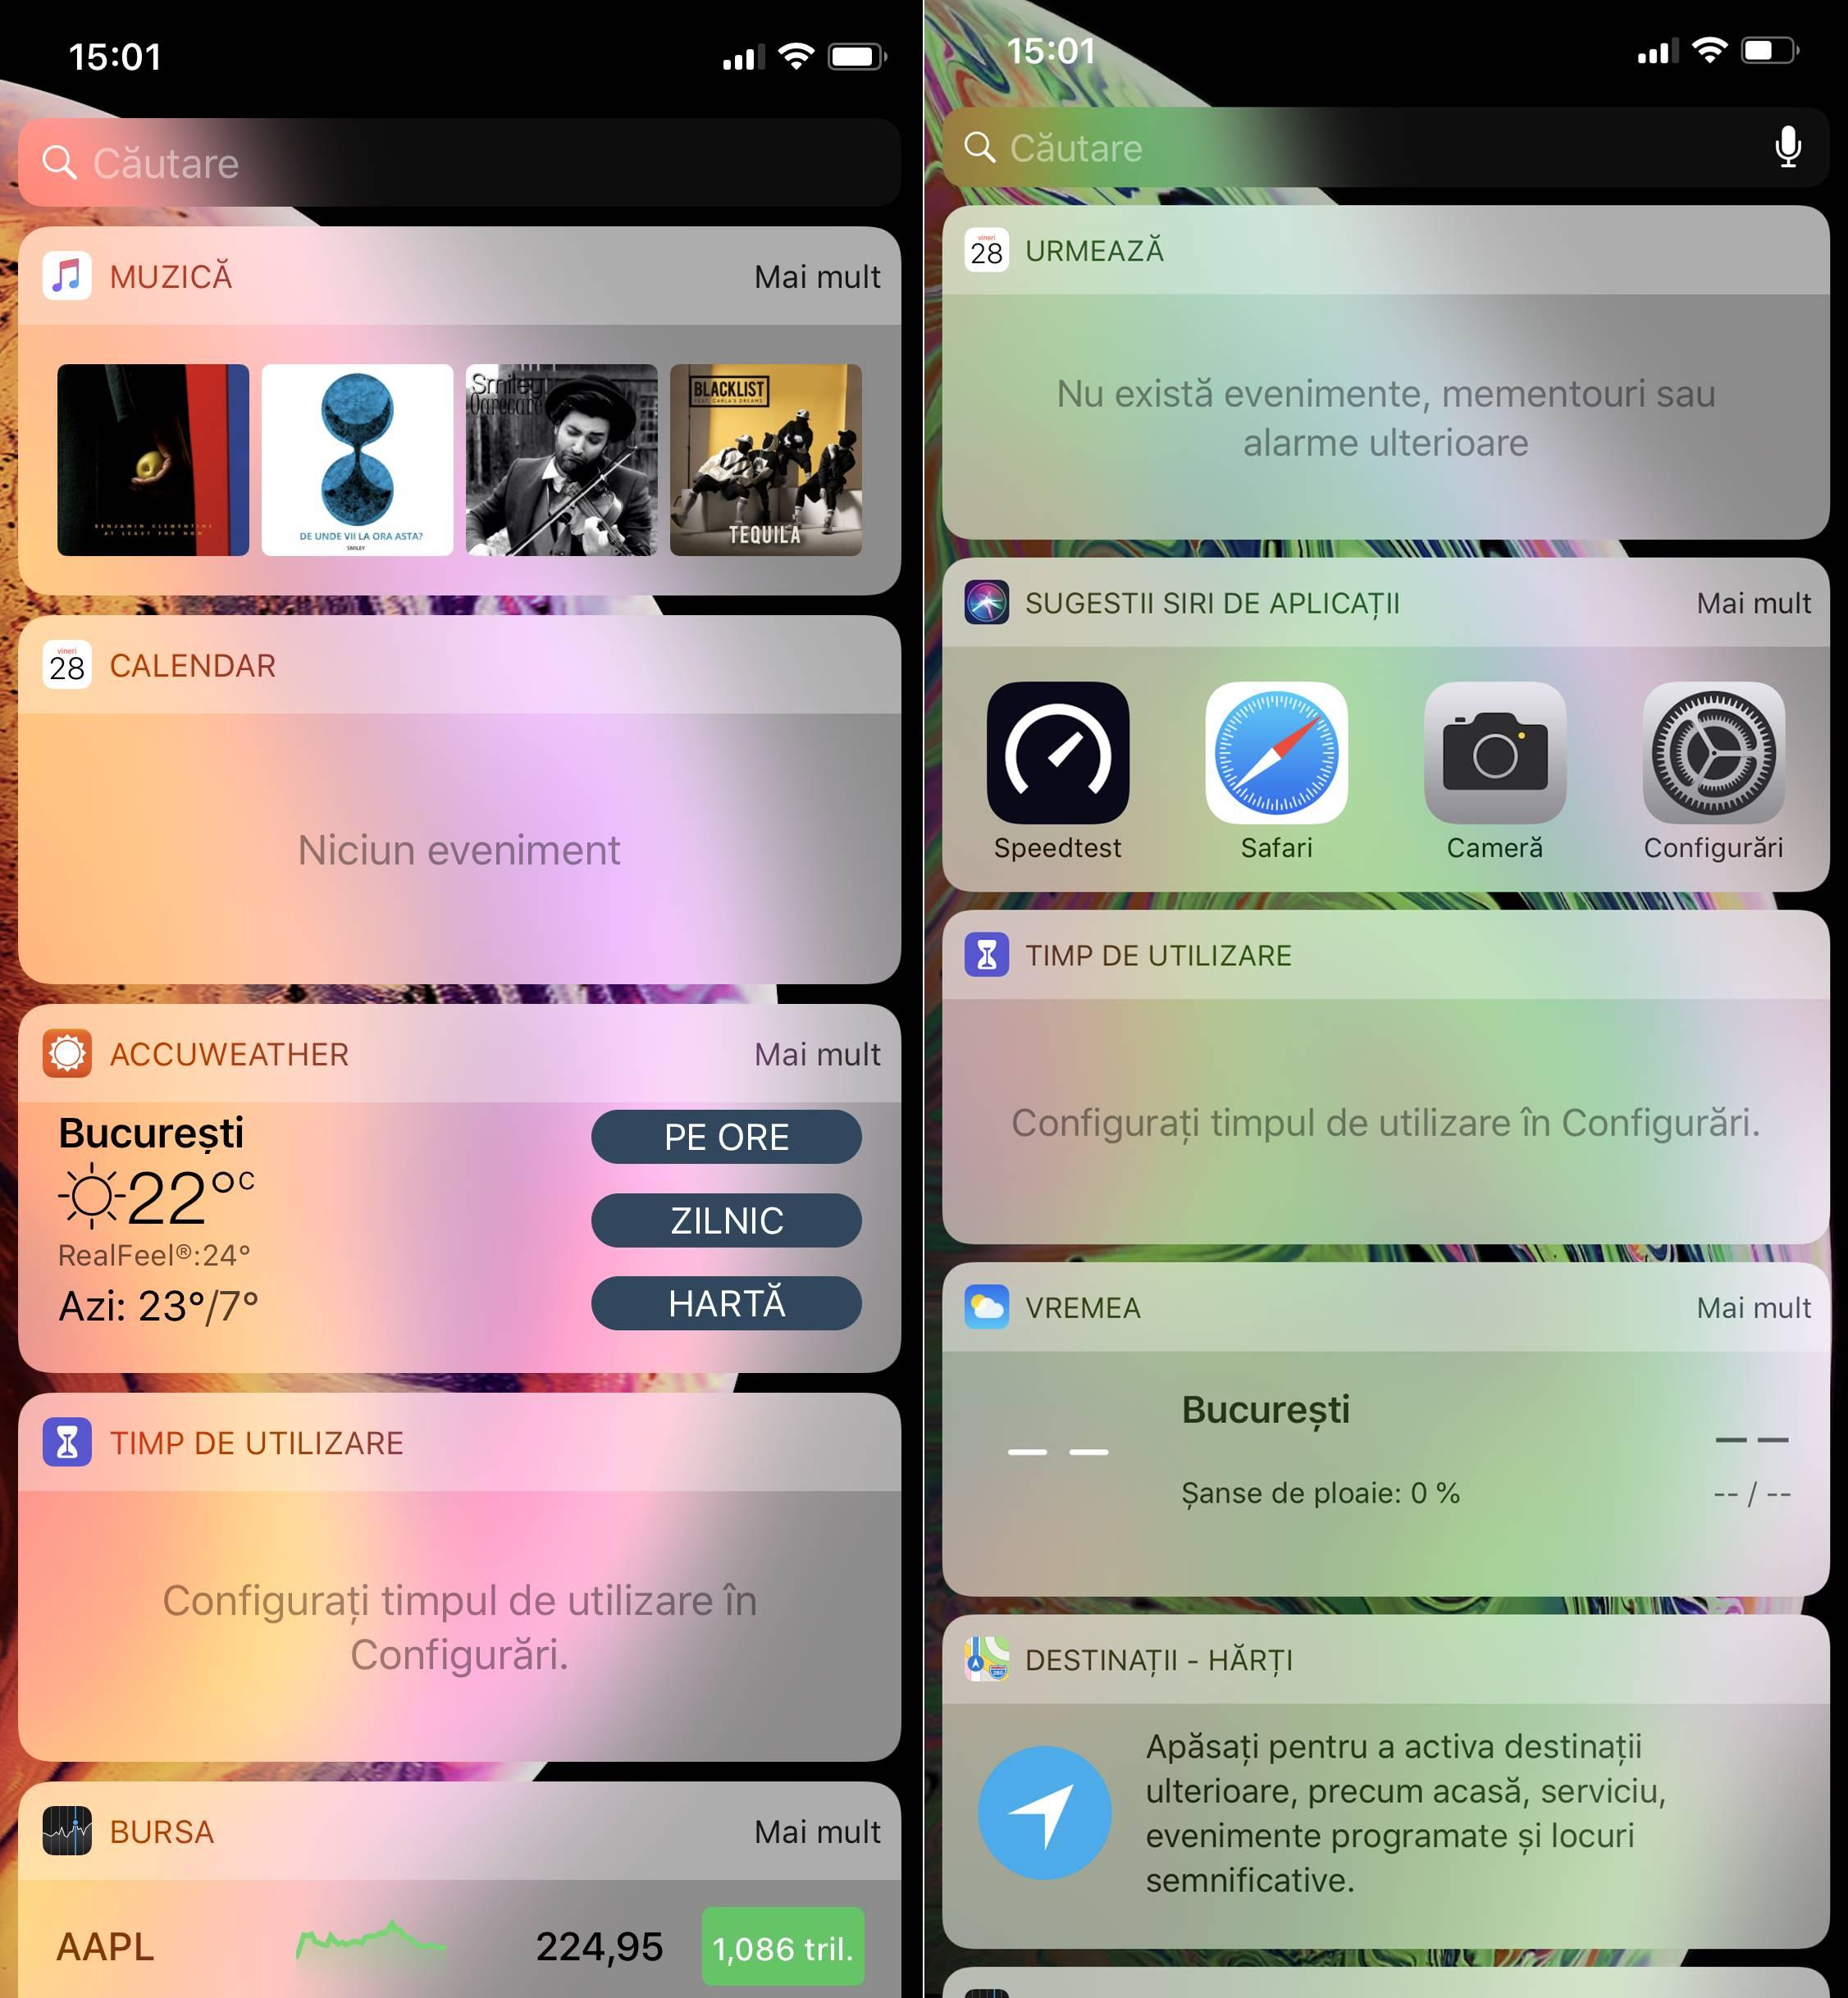 iphone xs max ecran iphone x 1